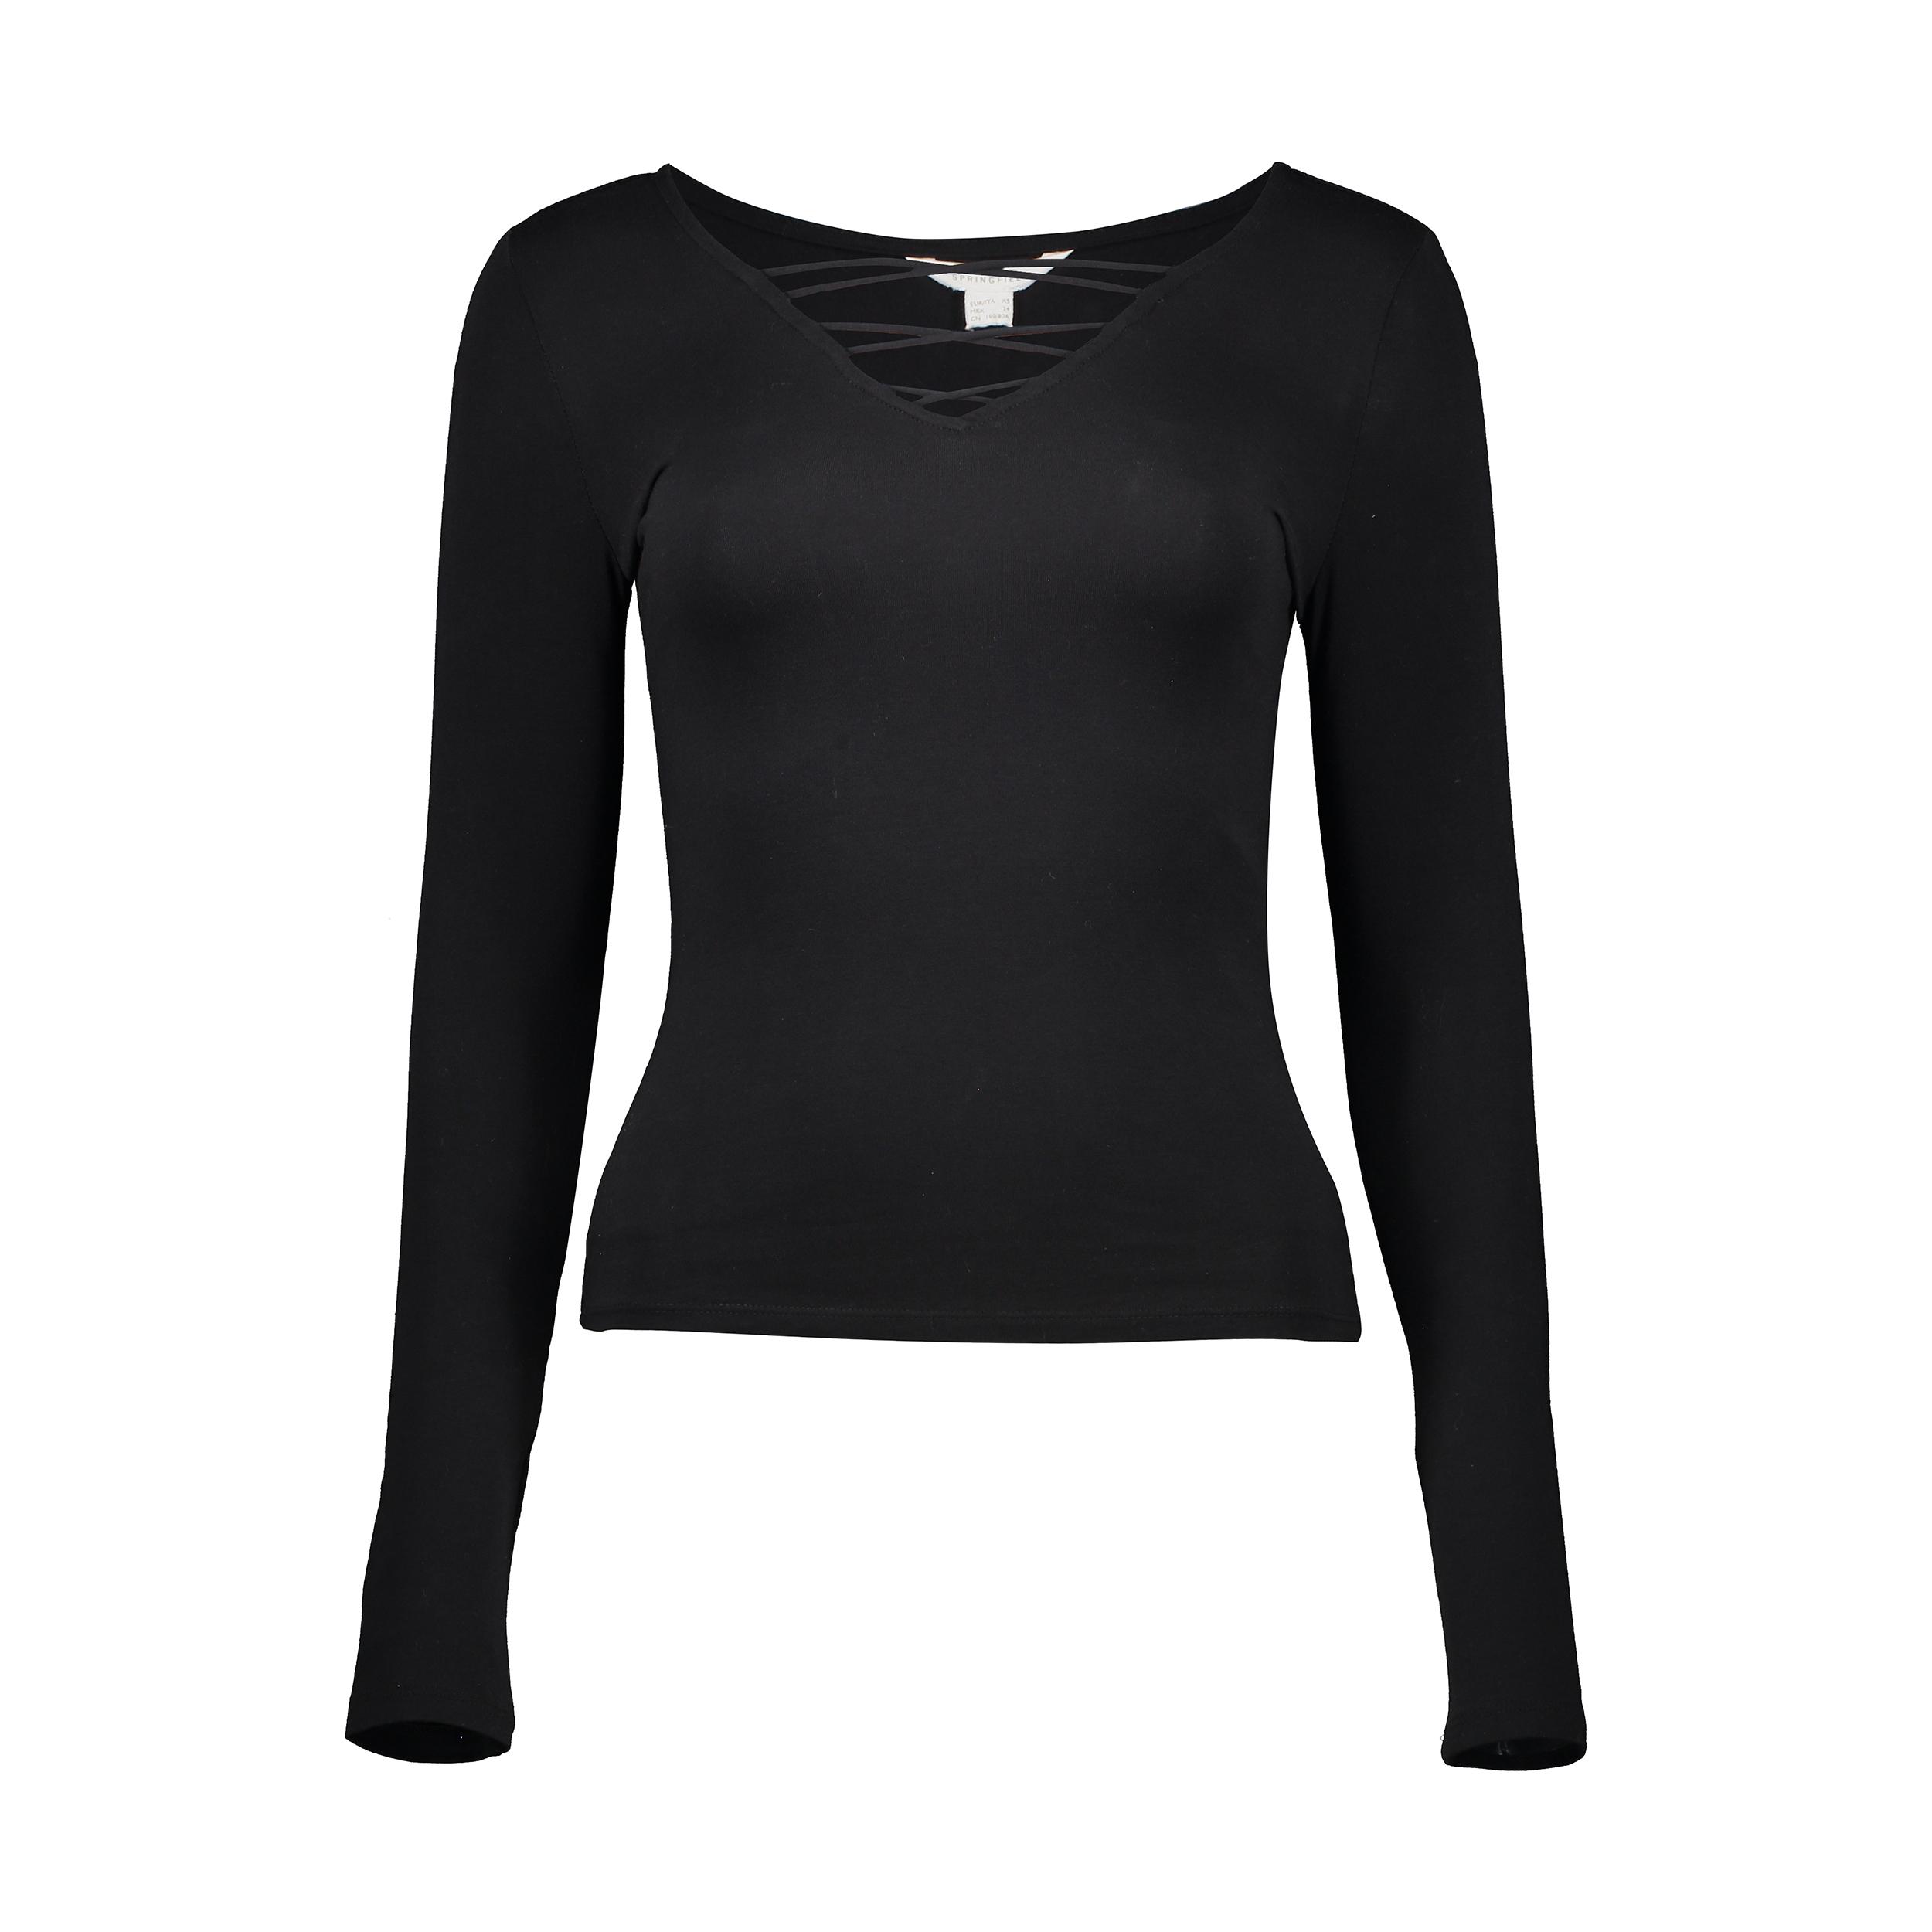 Photo of تی شرت زنانه اسپرینگ فیلد مدل 0074535-BLACK